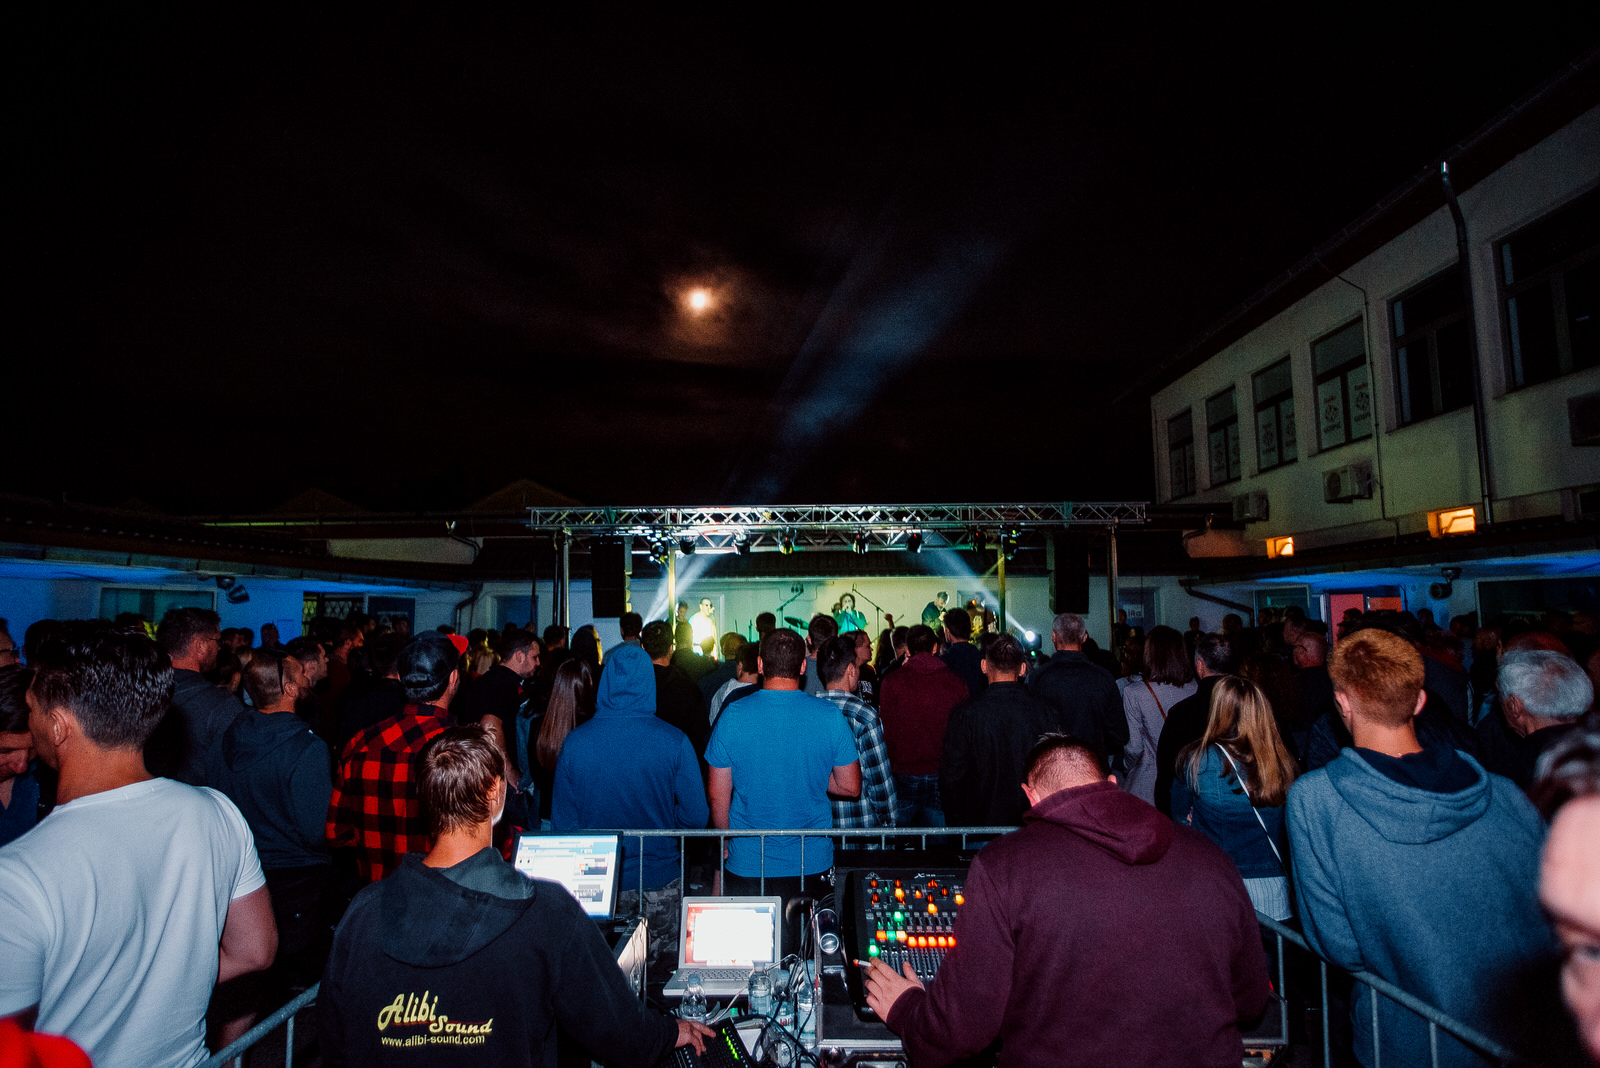 likaclub_grocks-2019_tbf-barbara-munjas-15